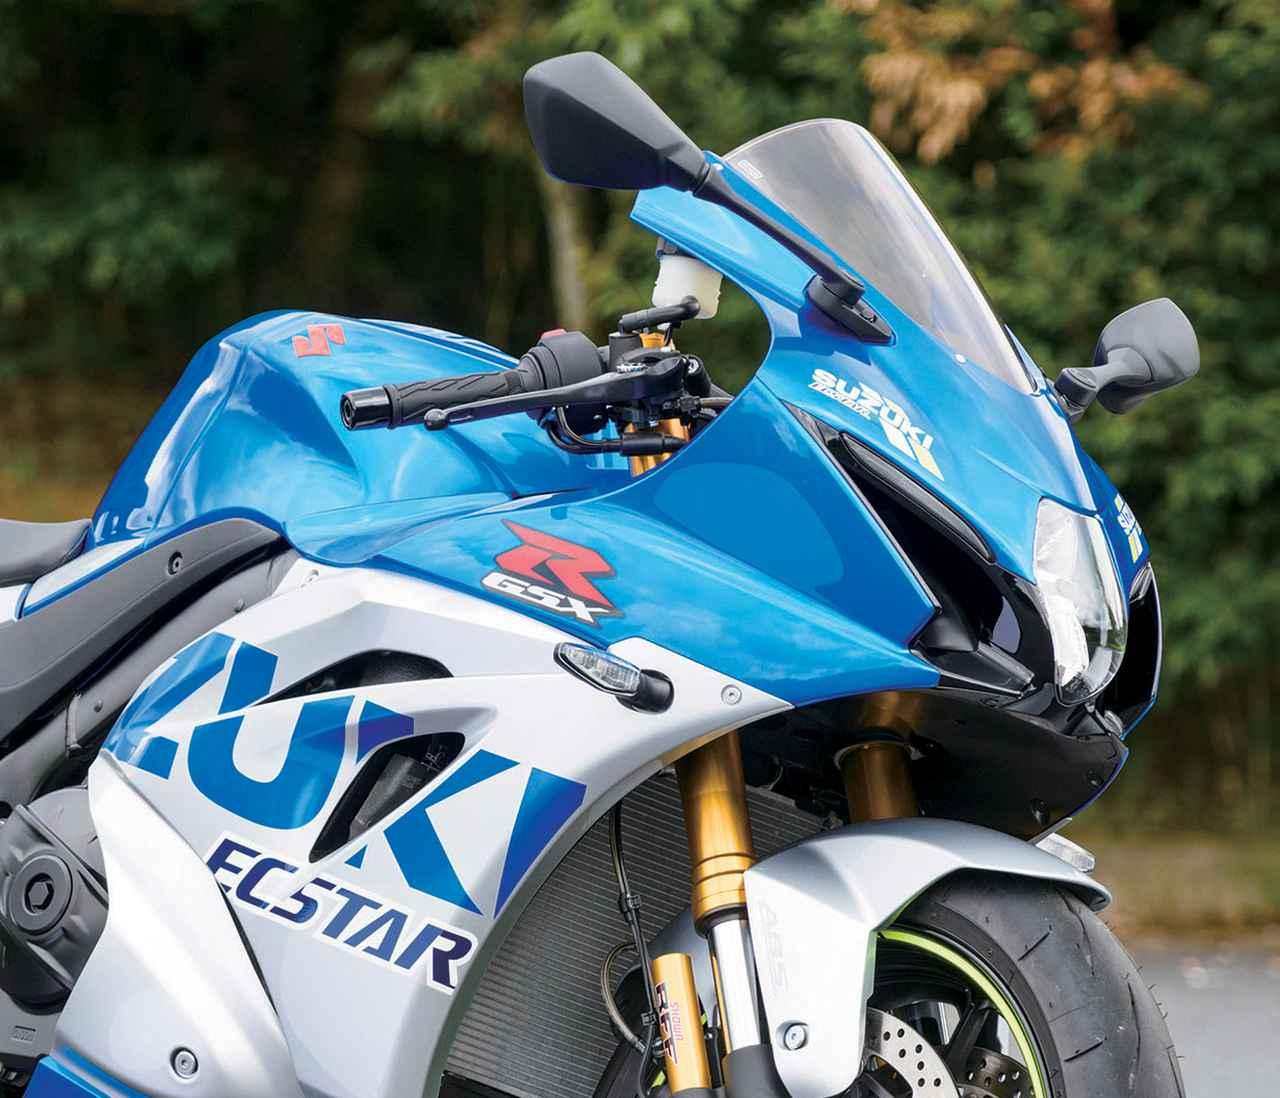 Images : 1番目の画像 - スズキ「GSX-R1000R ABS」 - webオートバイ